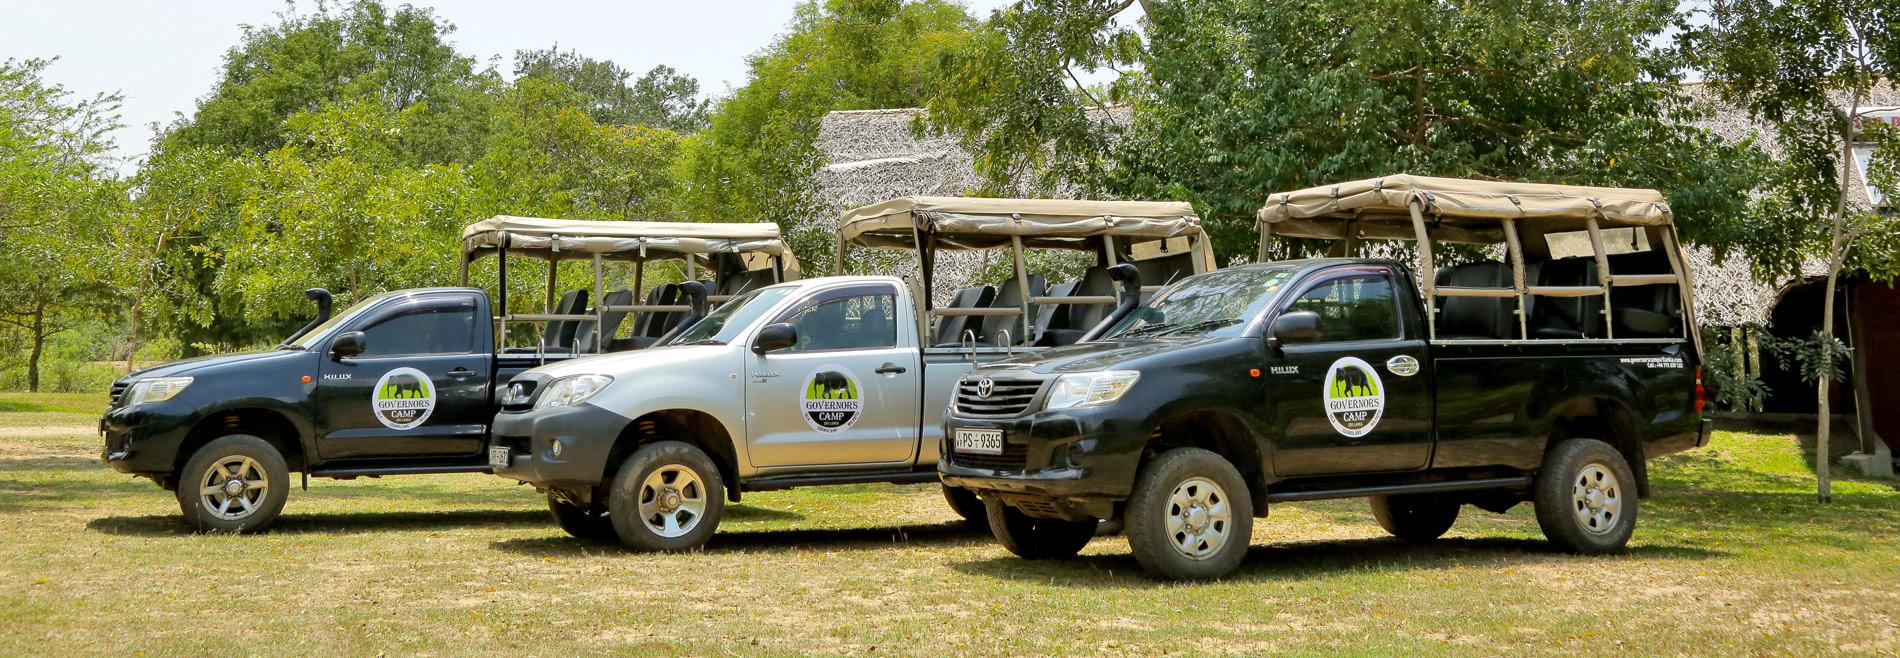 governors-camp-Wilpattu-safari-Jeeps-booking.jpg